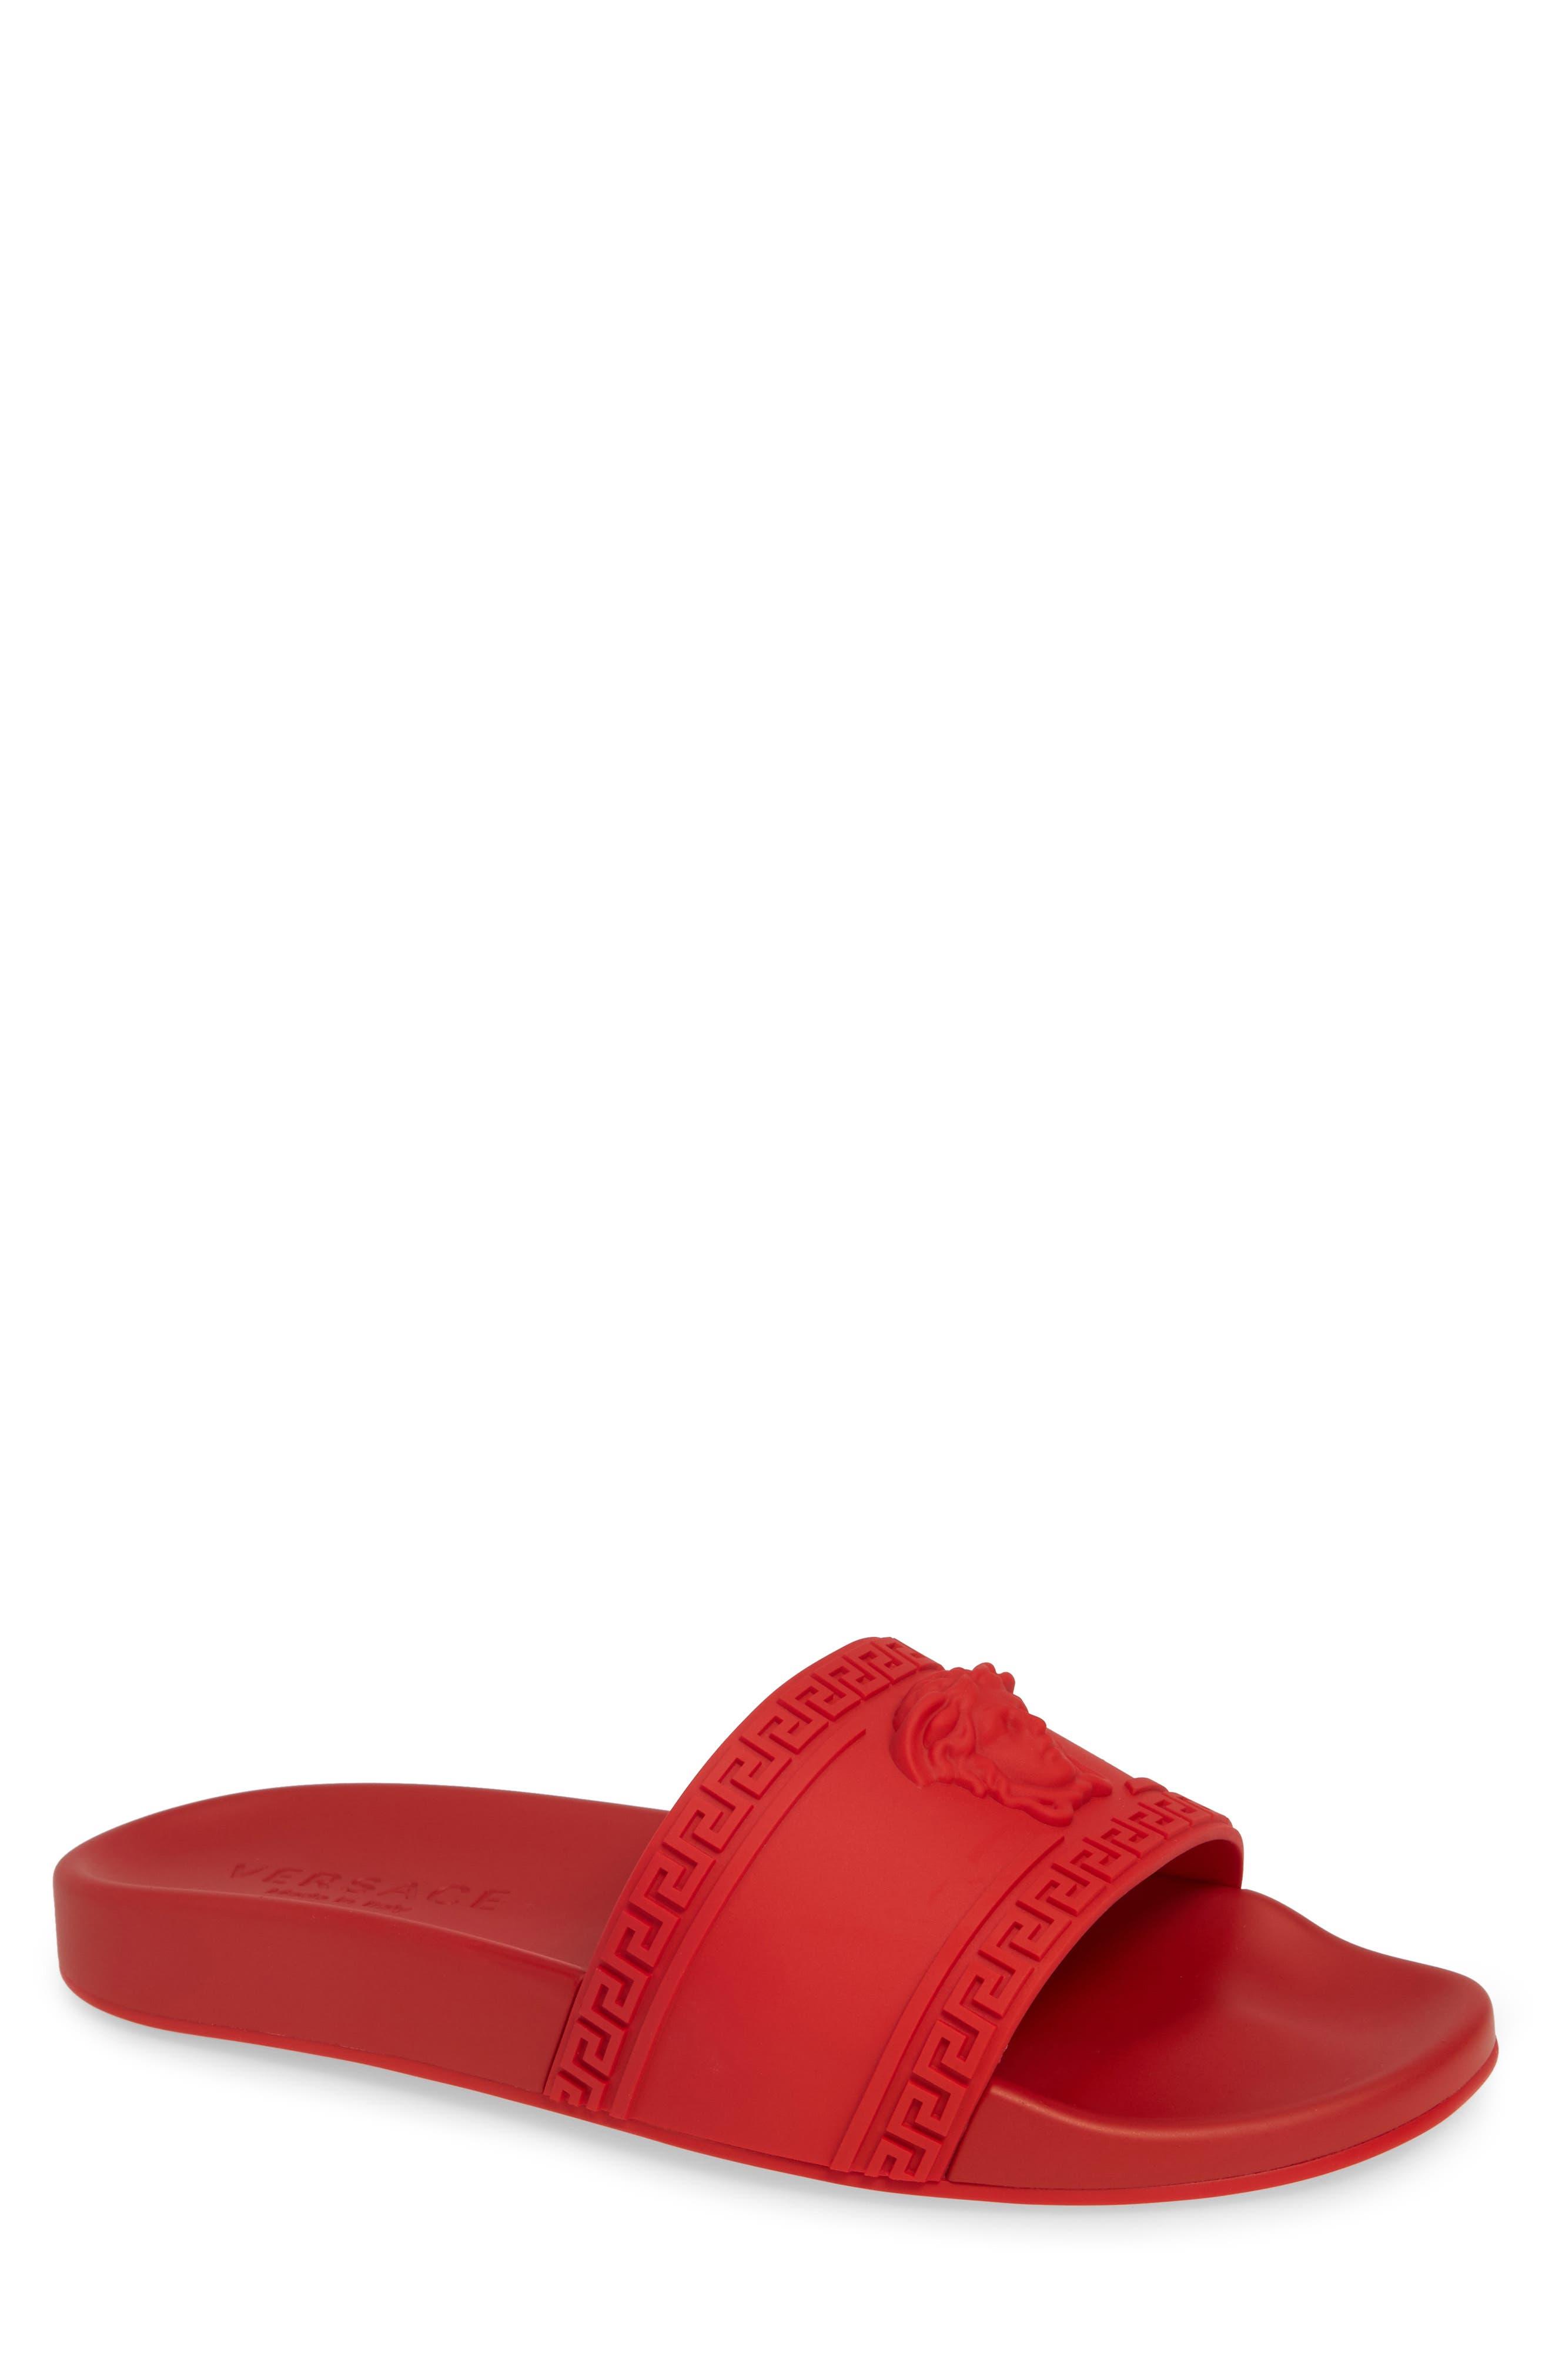 VERSACE Palazzo Medusa Slide Sandal, Main, color, RED